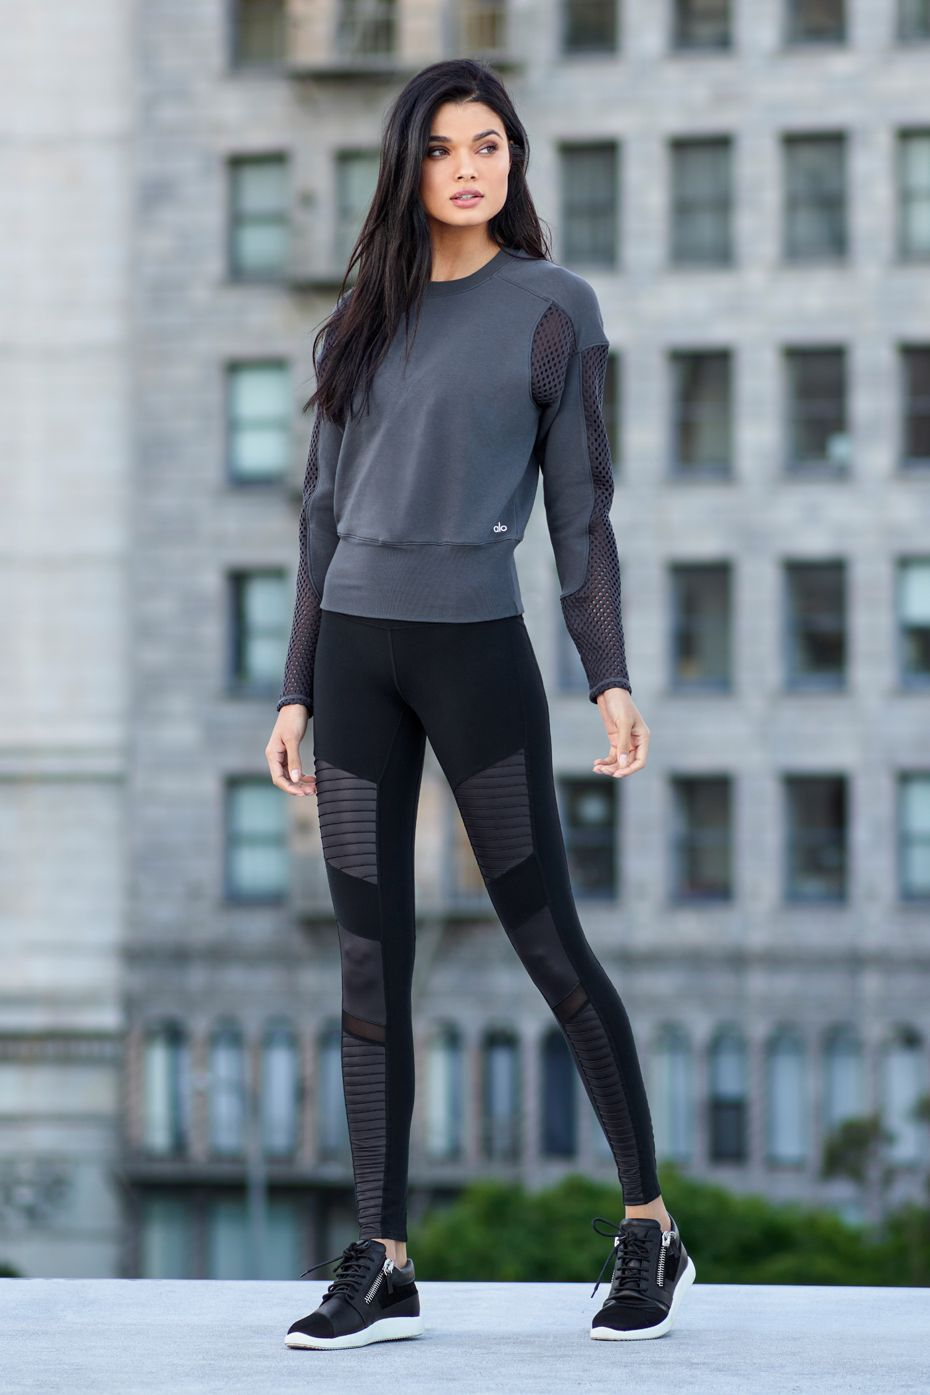 19 Sublime Urban Fashion Streetwear Outfit Ideas Sporty Outfits Sportswear Fashion Outfits With Leggings